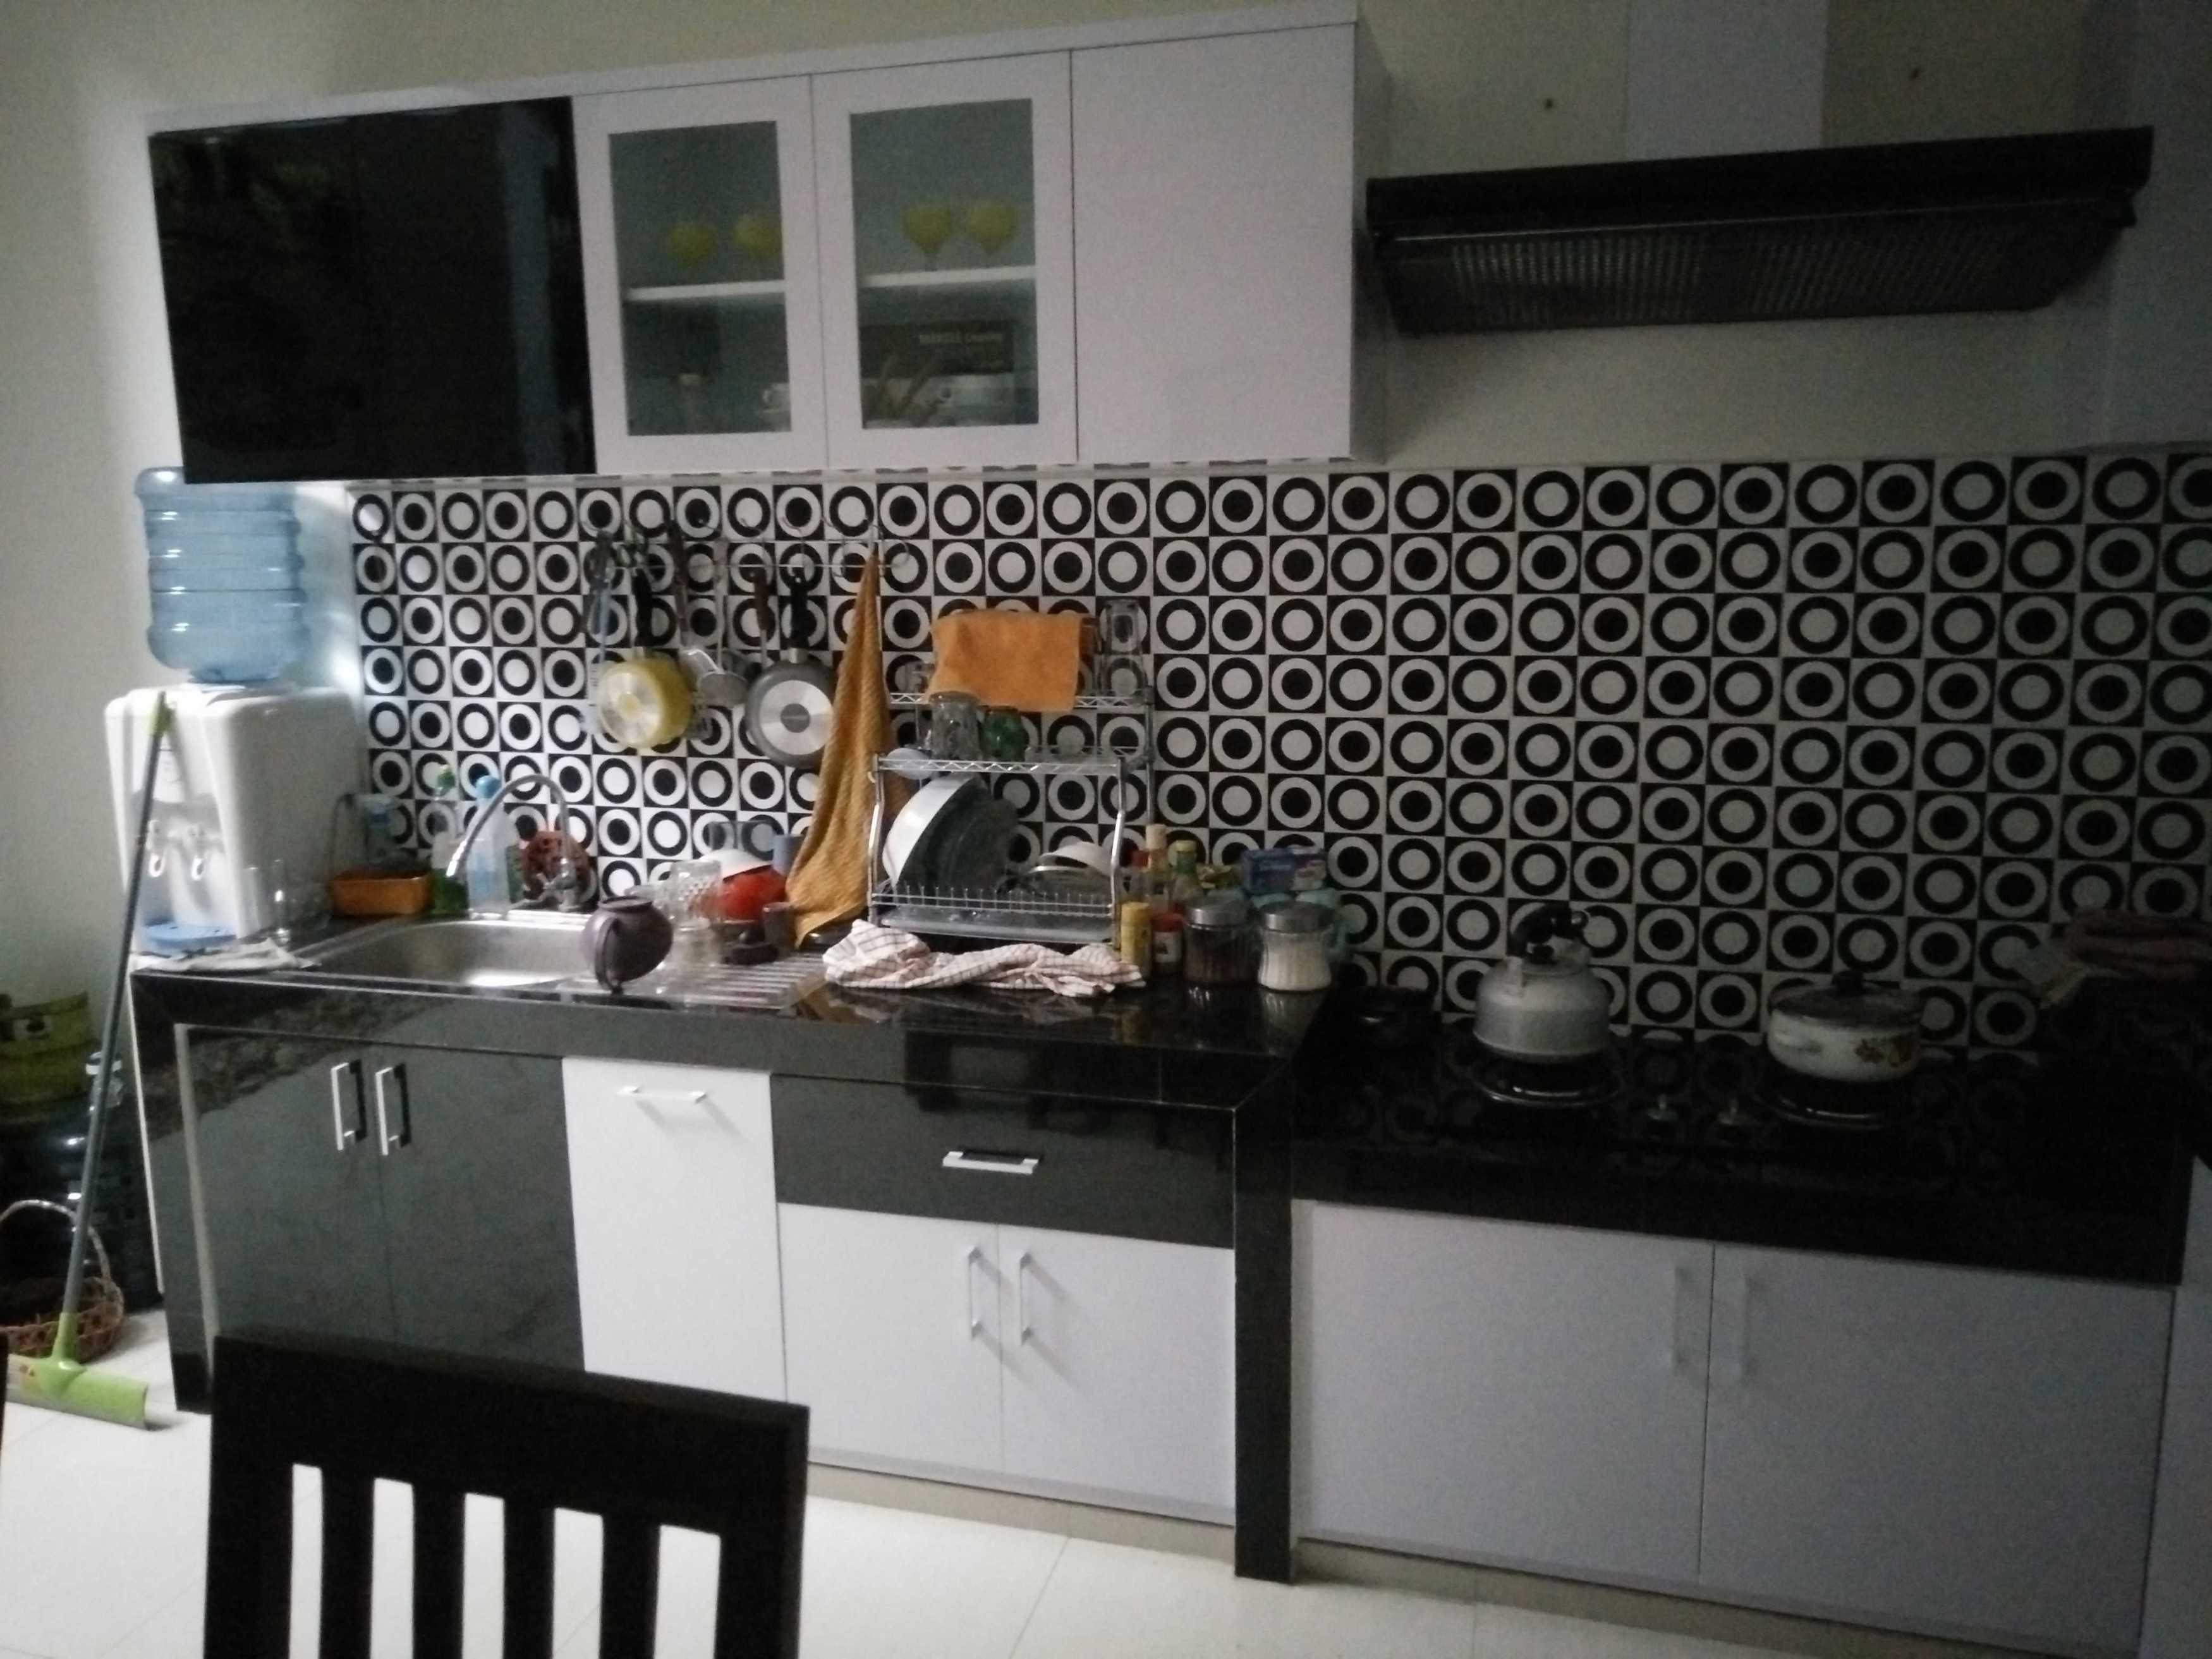 Trend Arch Kitchen Set Pandaan, Pasuruan, Jawa Timur, Indonesia Pandaan, Pasuruan, Jawa Timur, Indonesia Kitchen Set Minimalist  41639